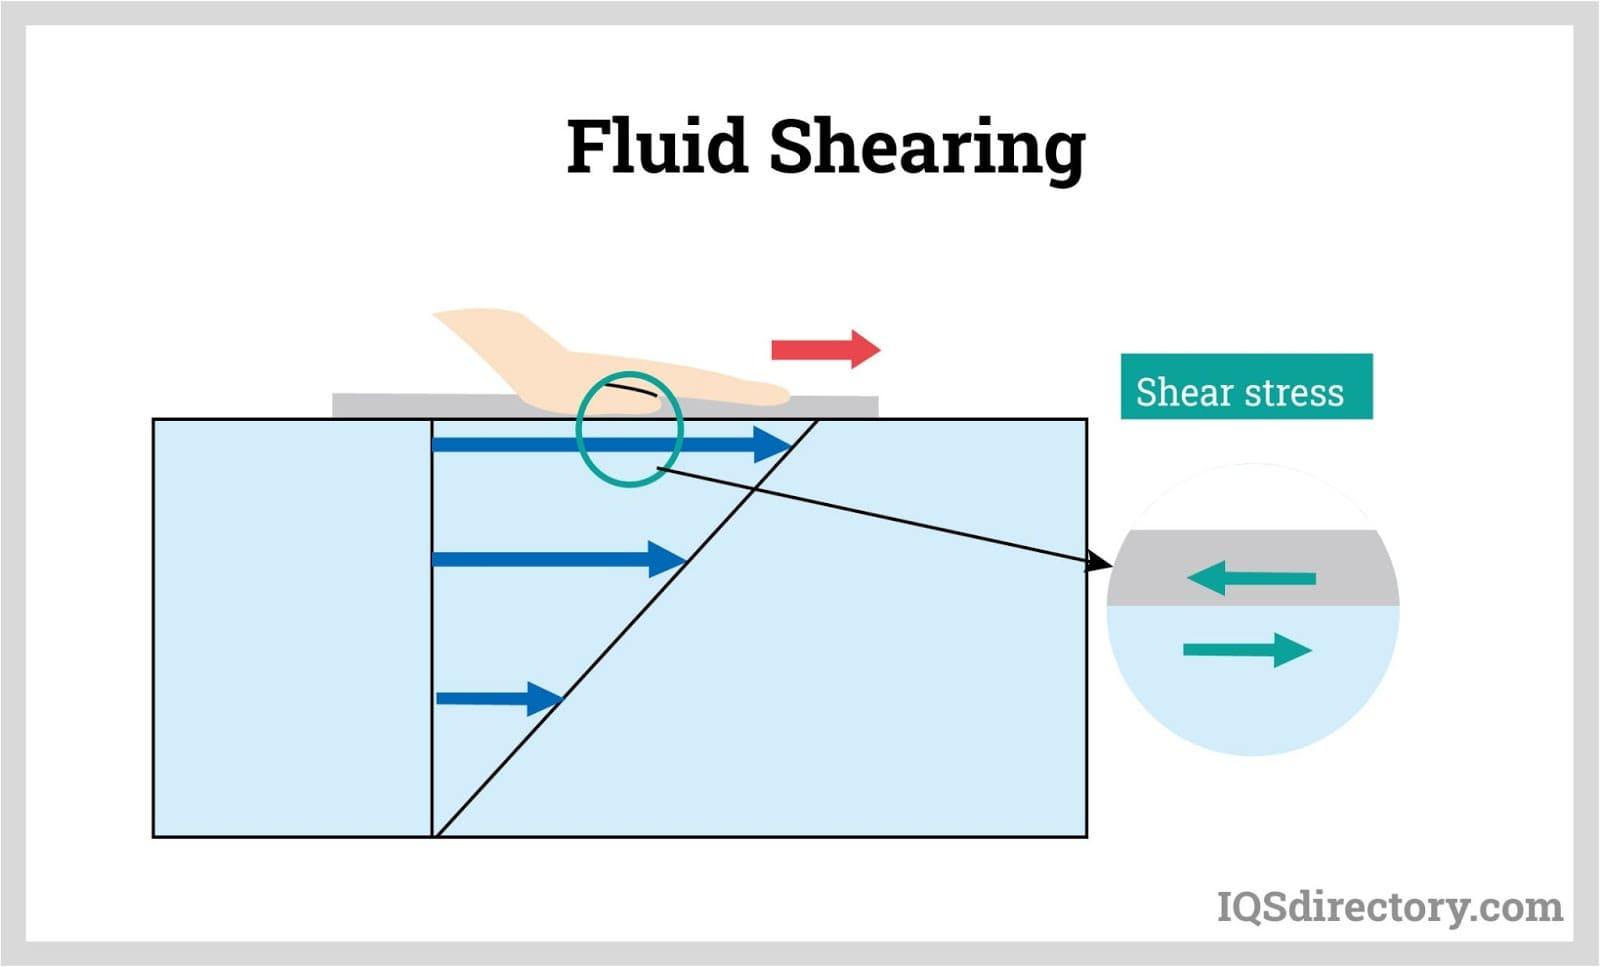 Fluid Shearing